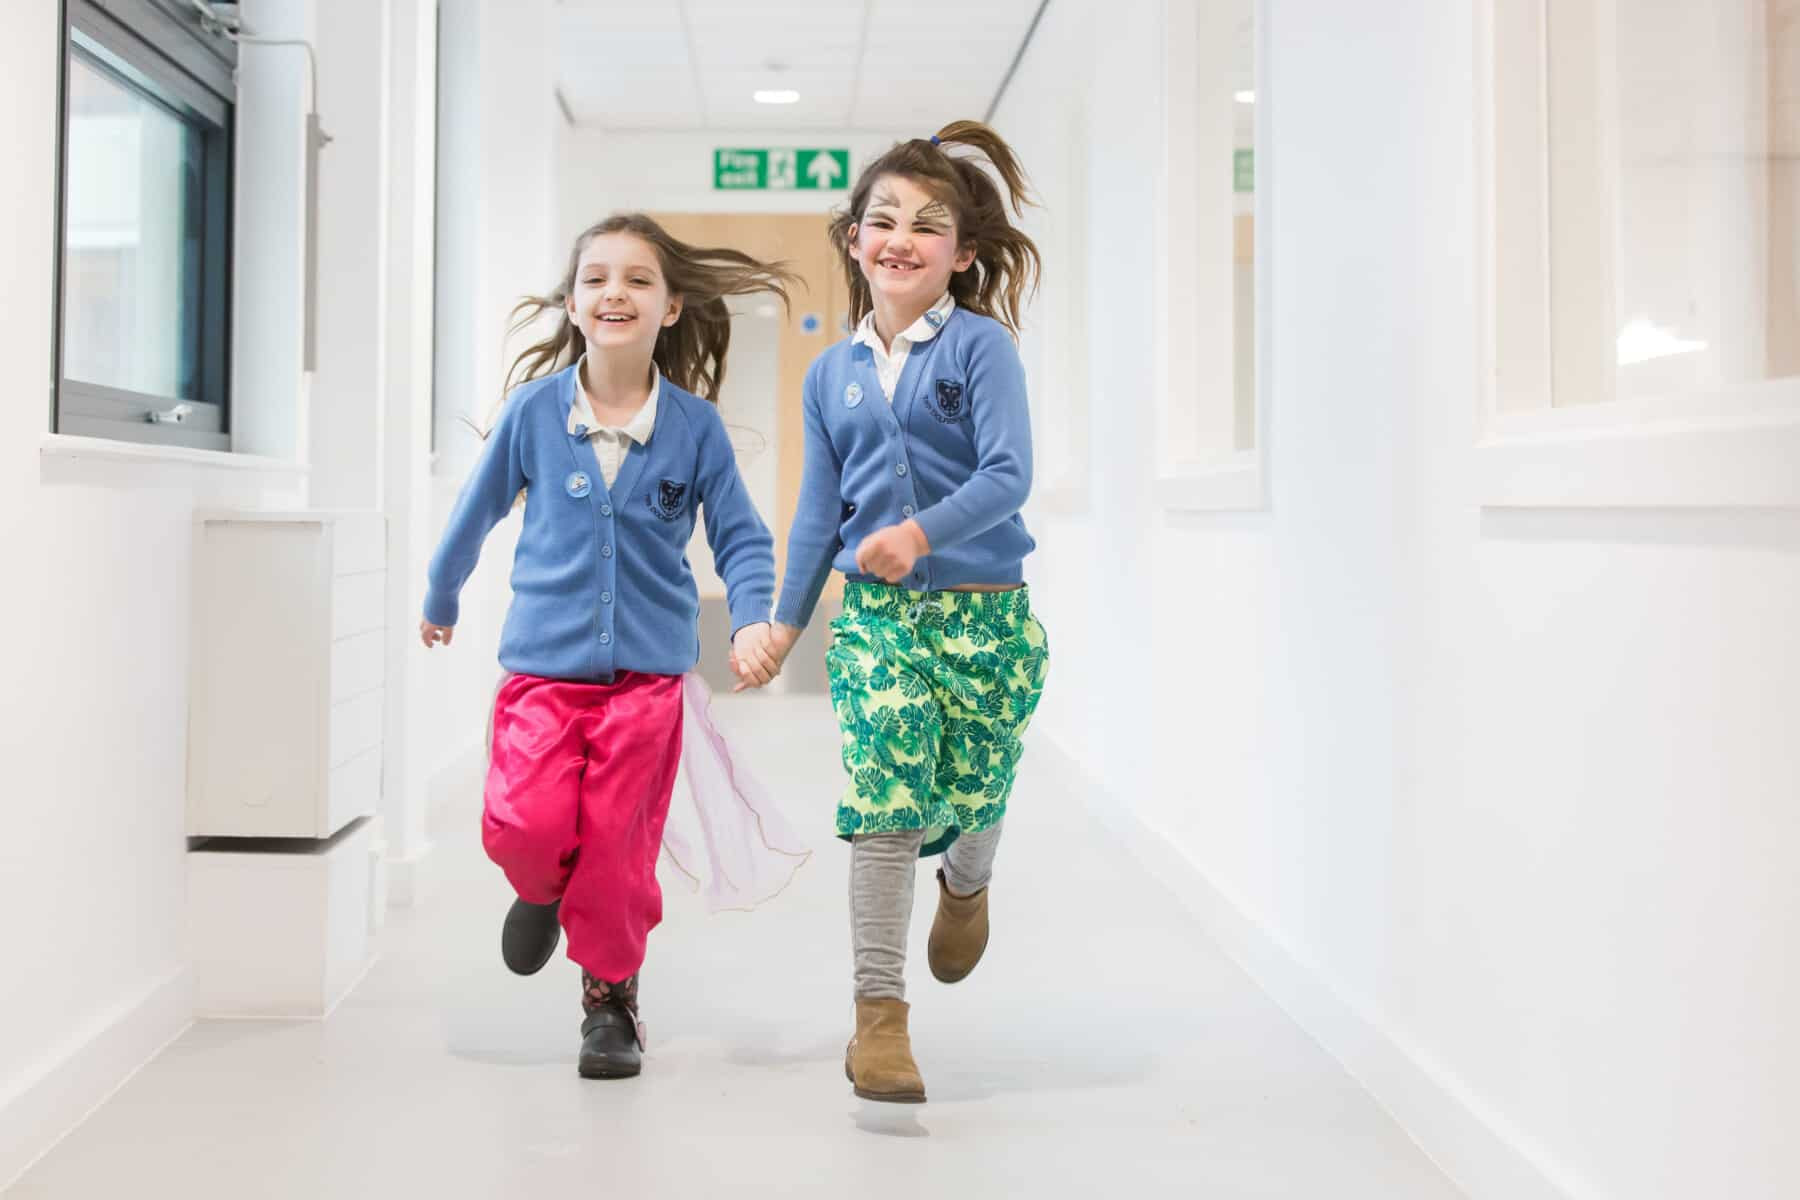 girls from school running down the corridor